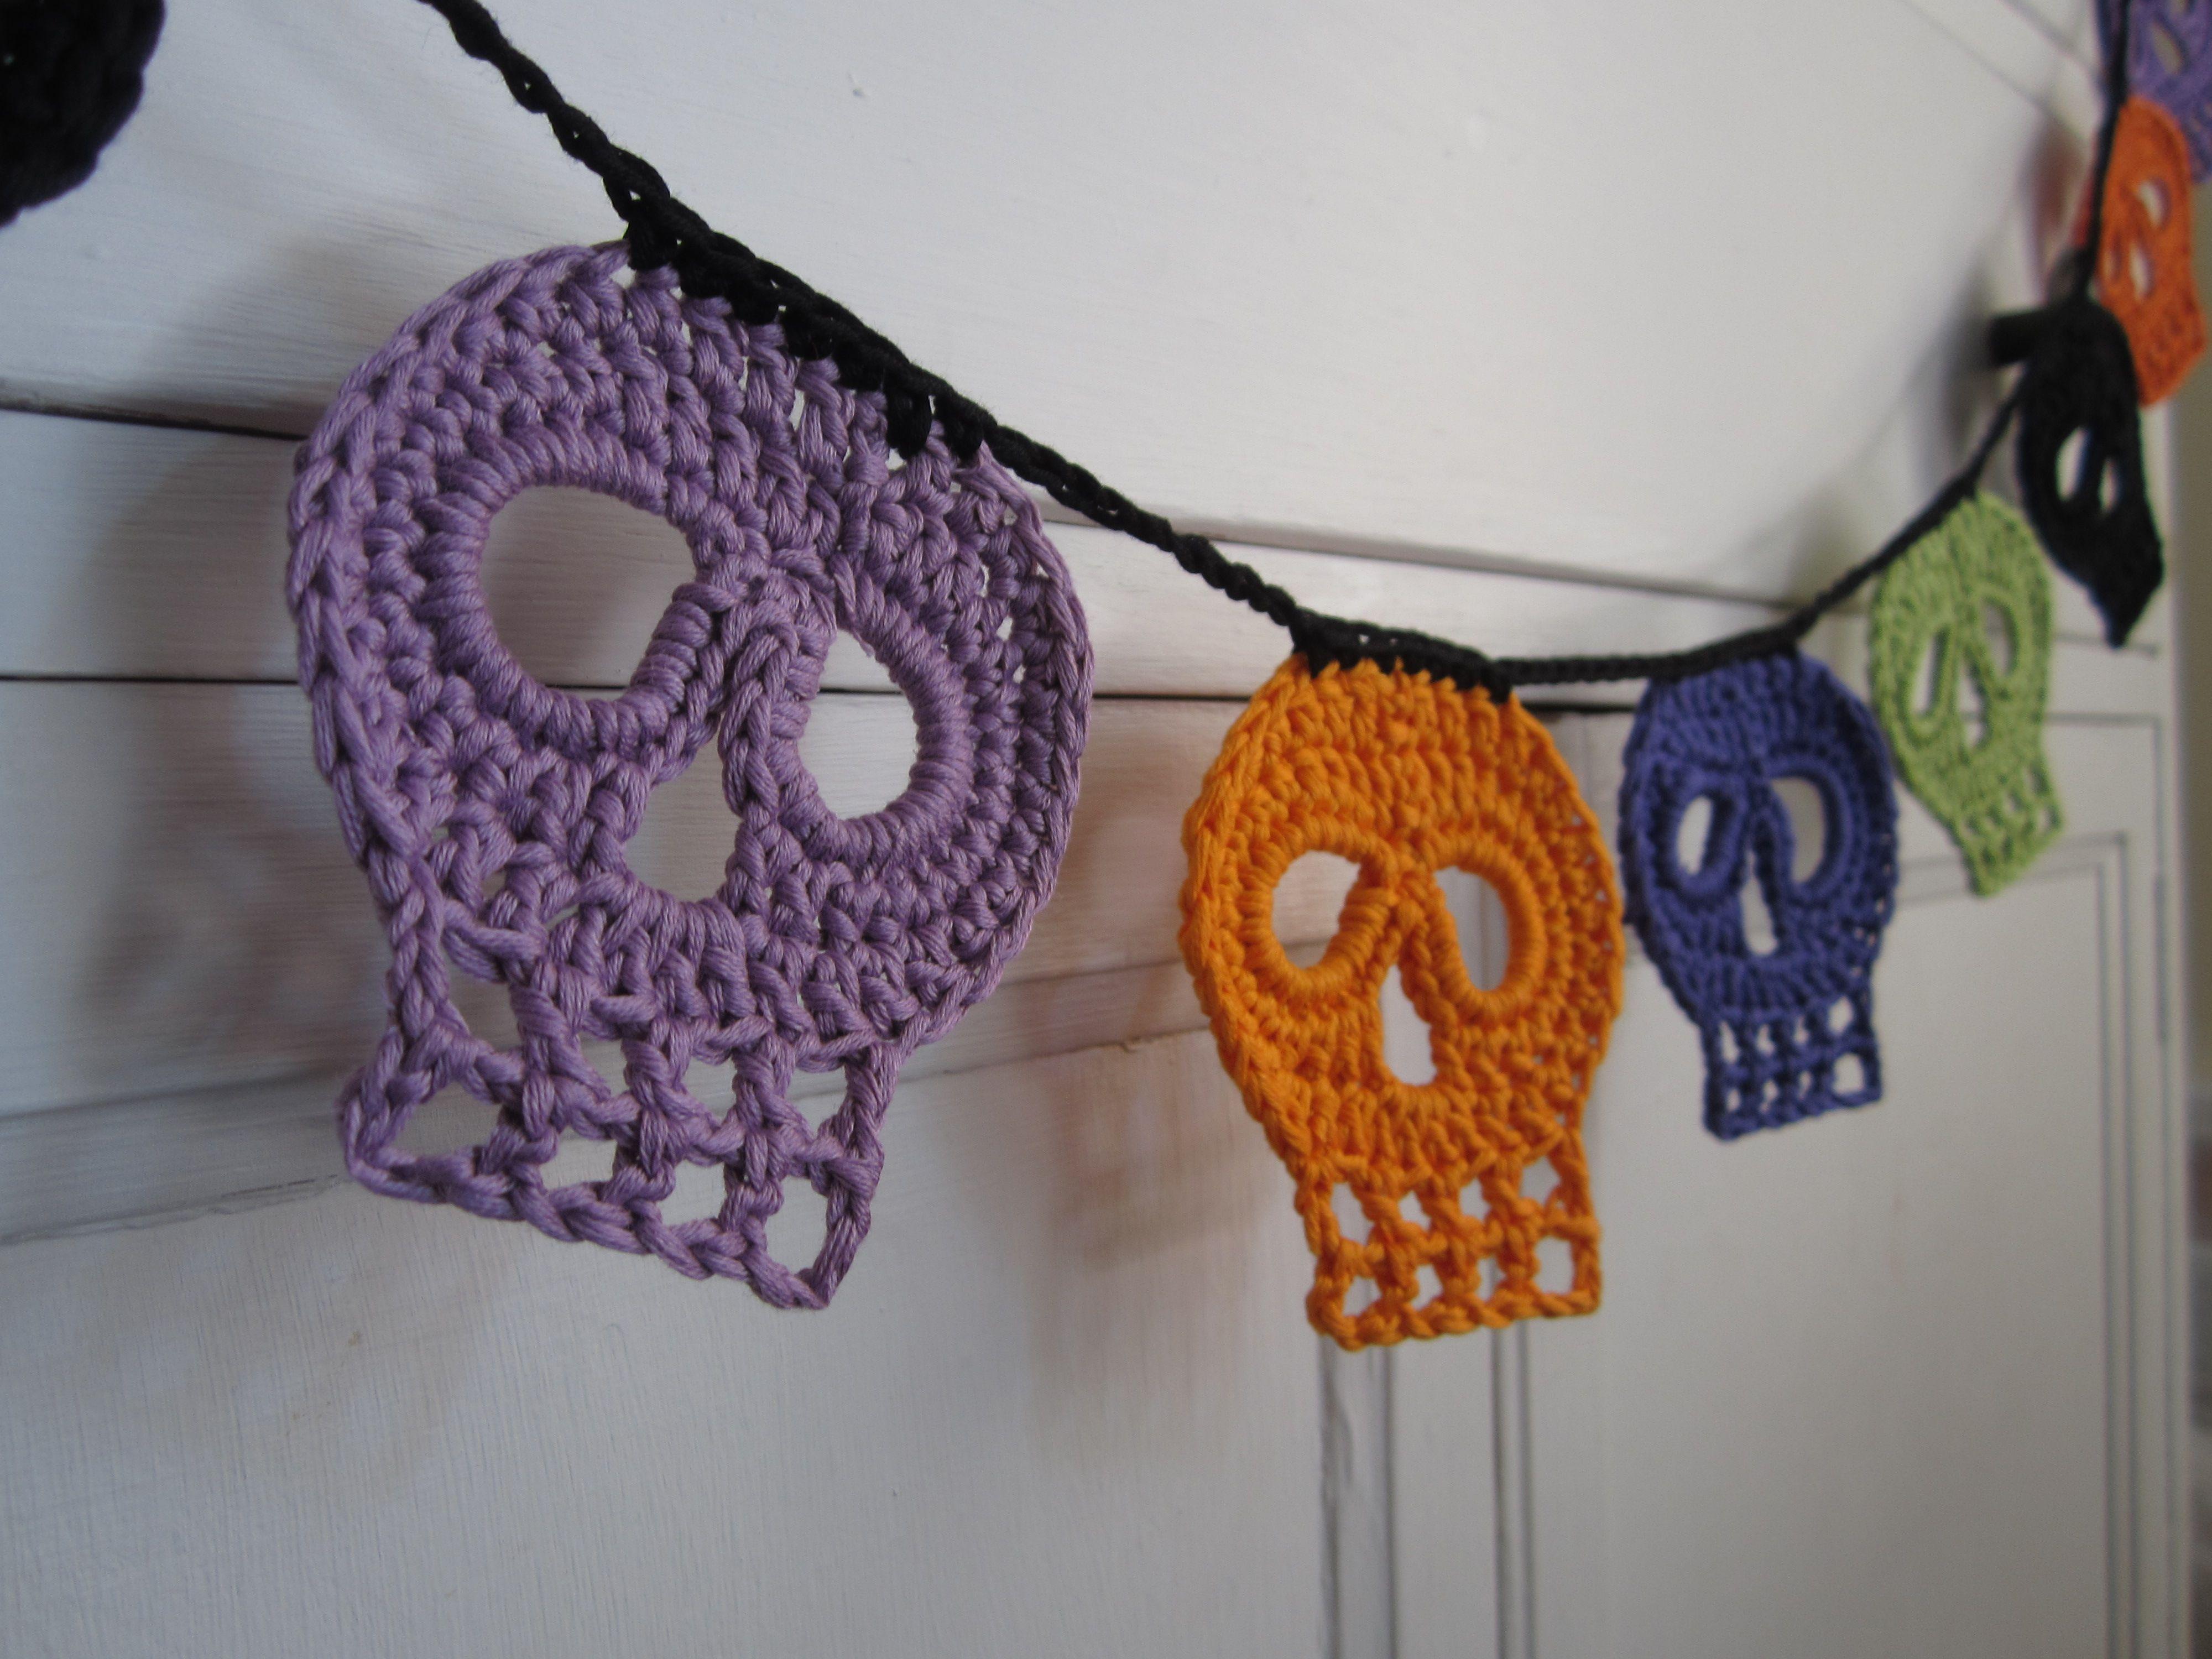 Halloween crochet | Girlanden, Halloween und Häkeln